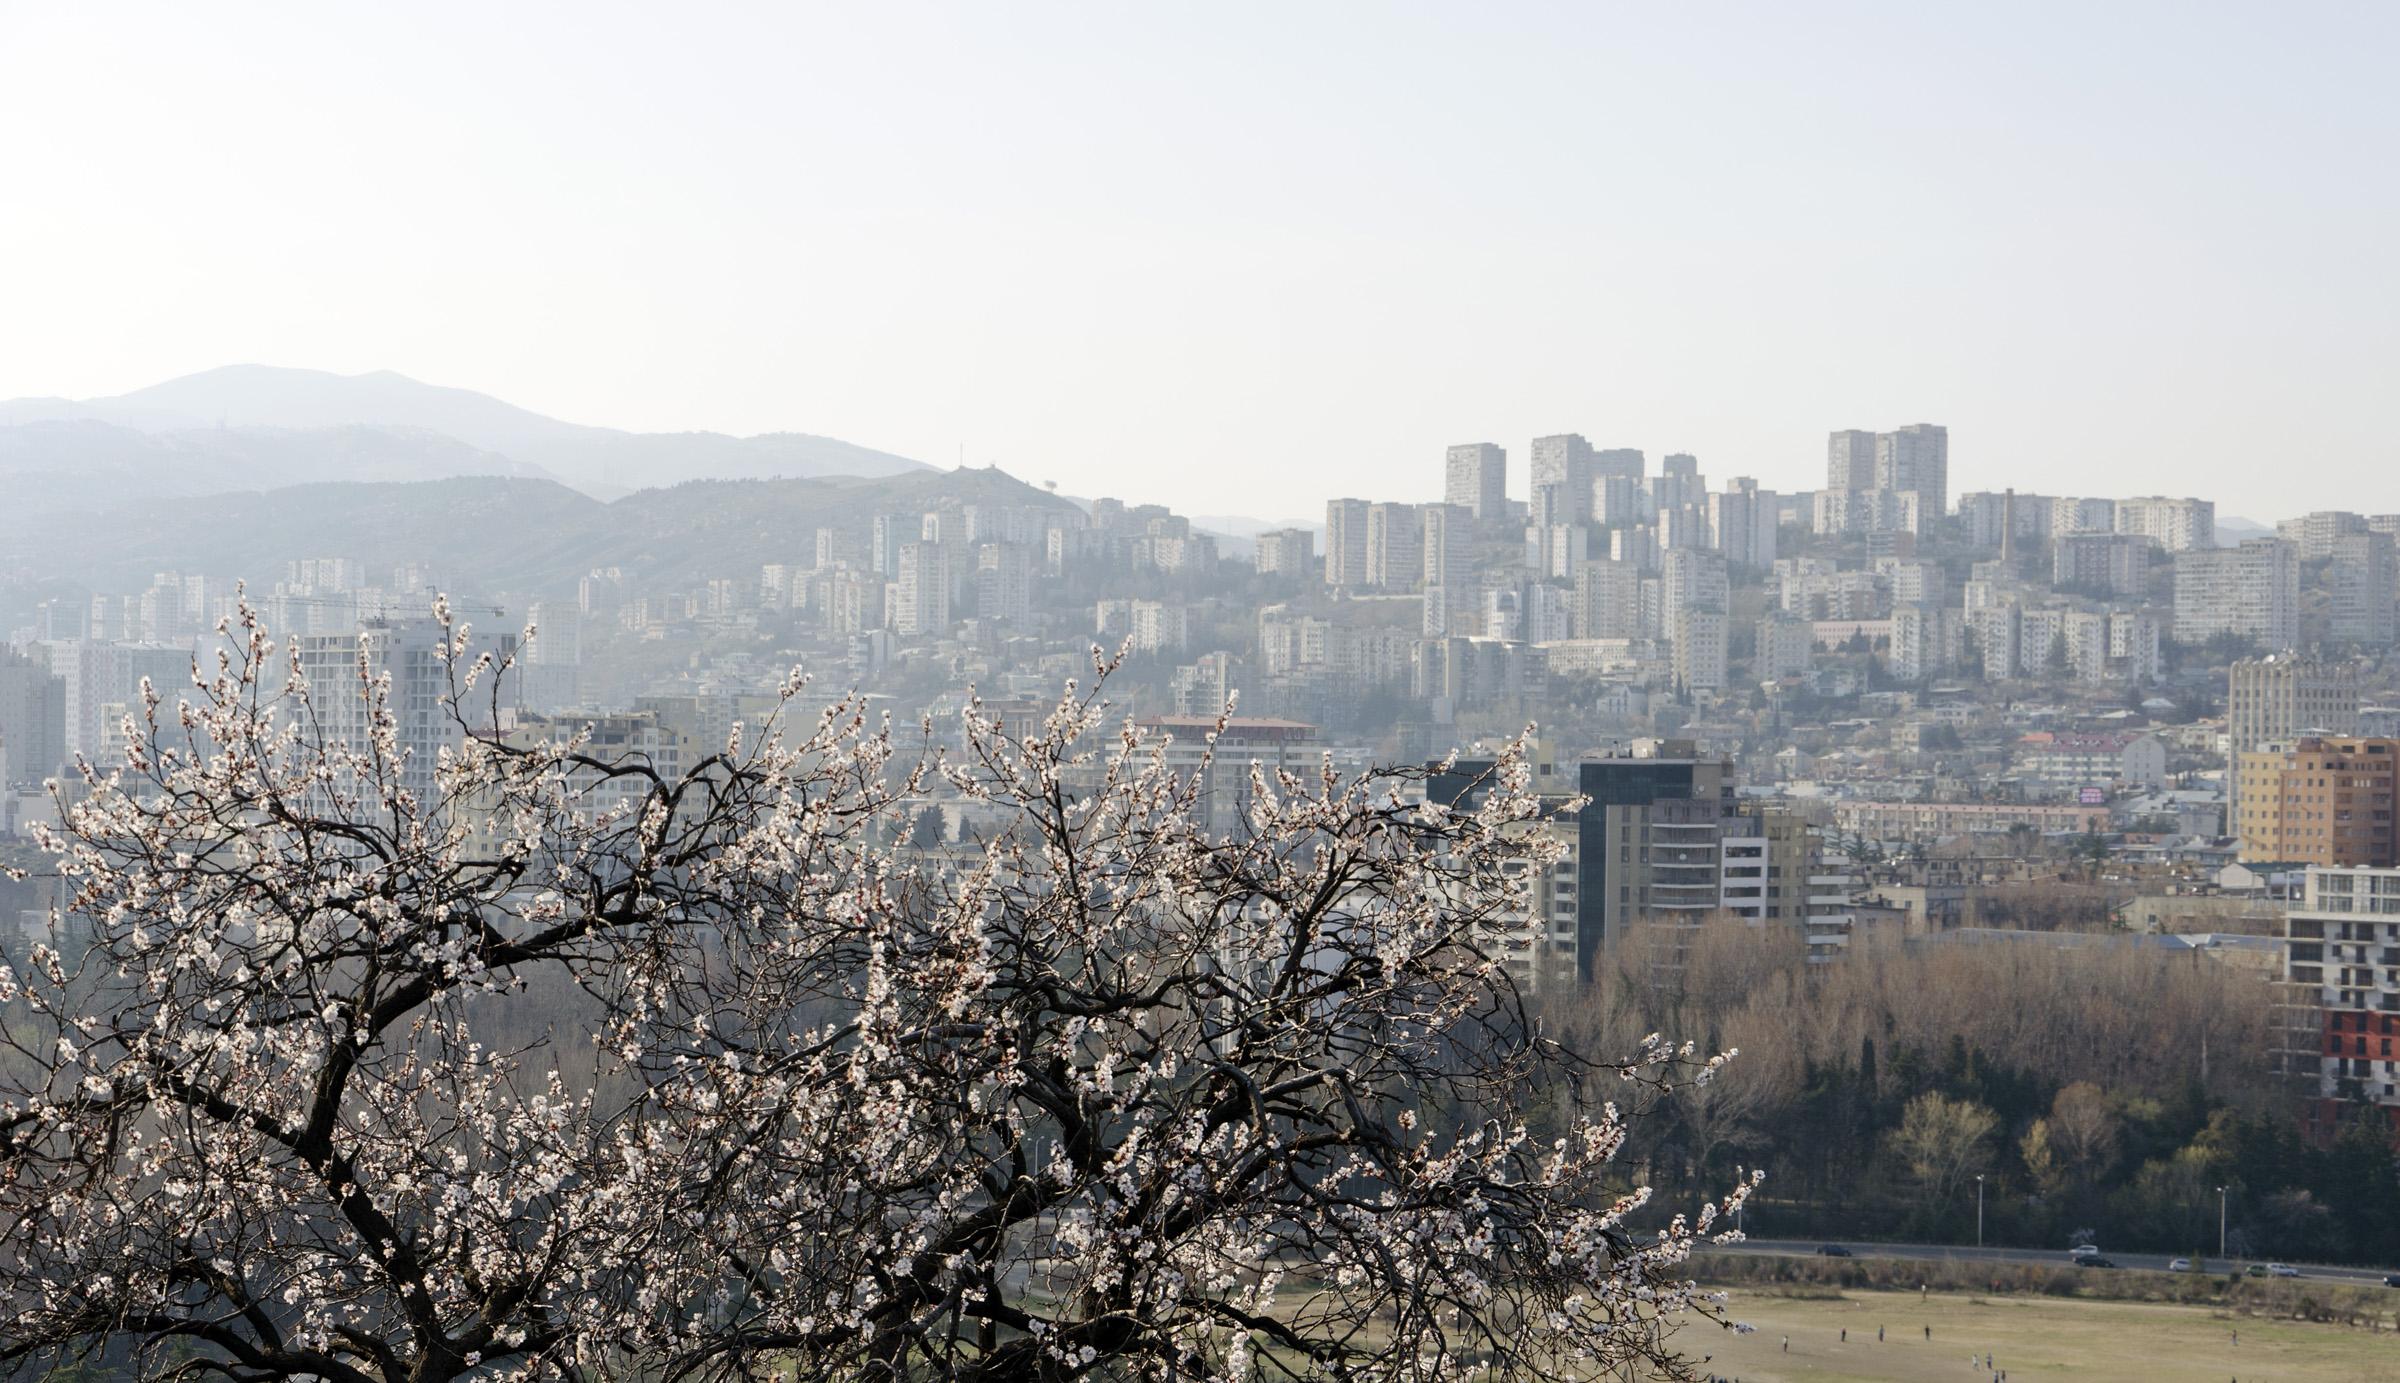 Tbilisi, Georgia - by Oleksandr Burlaka